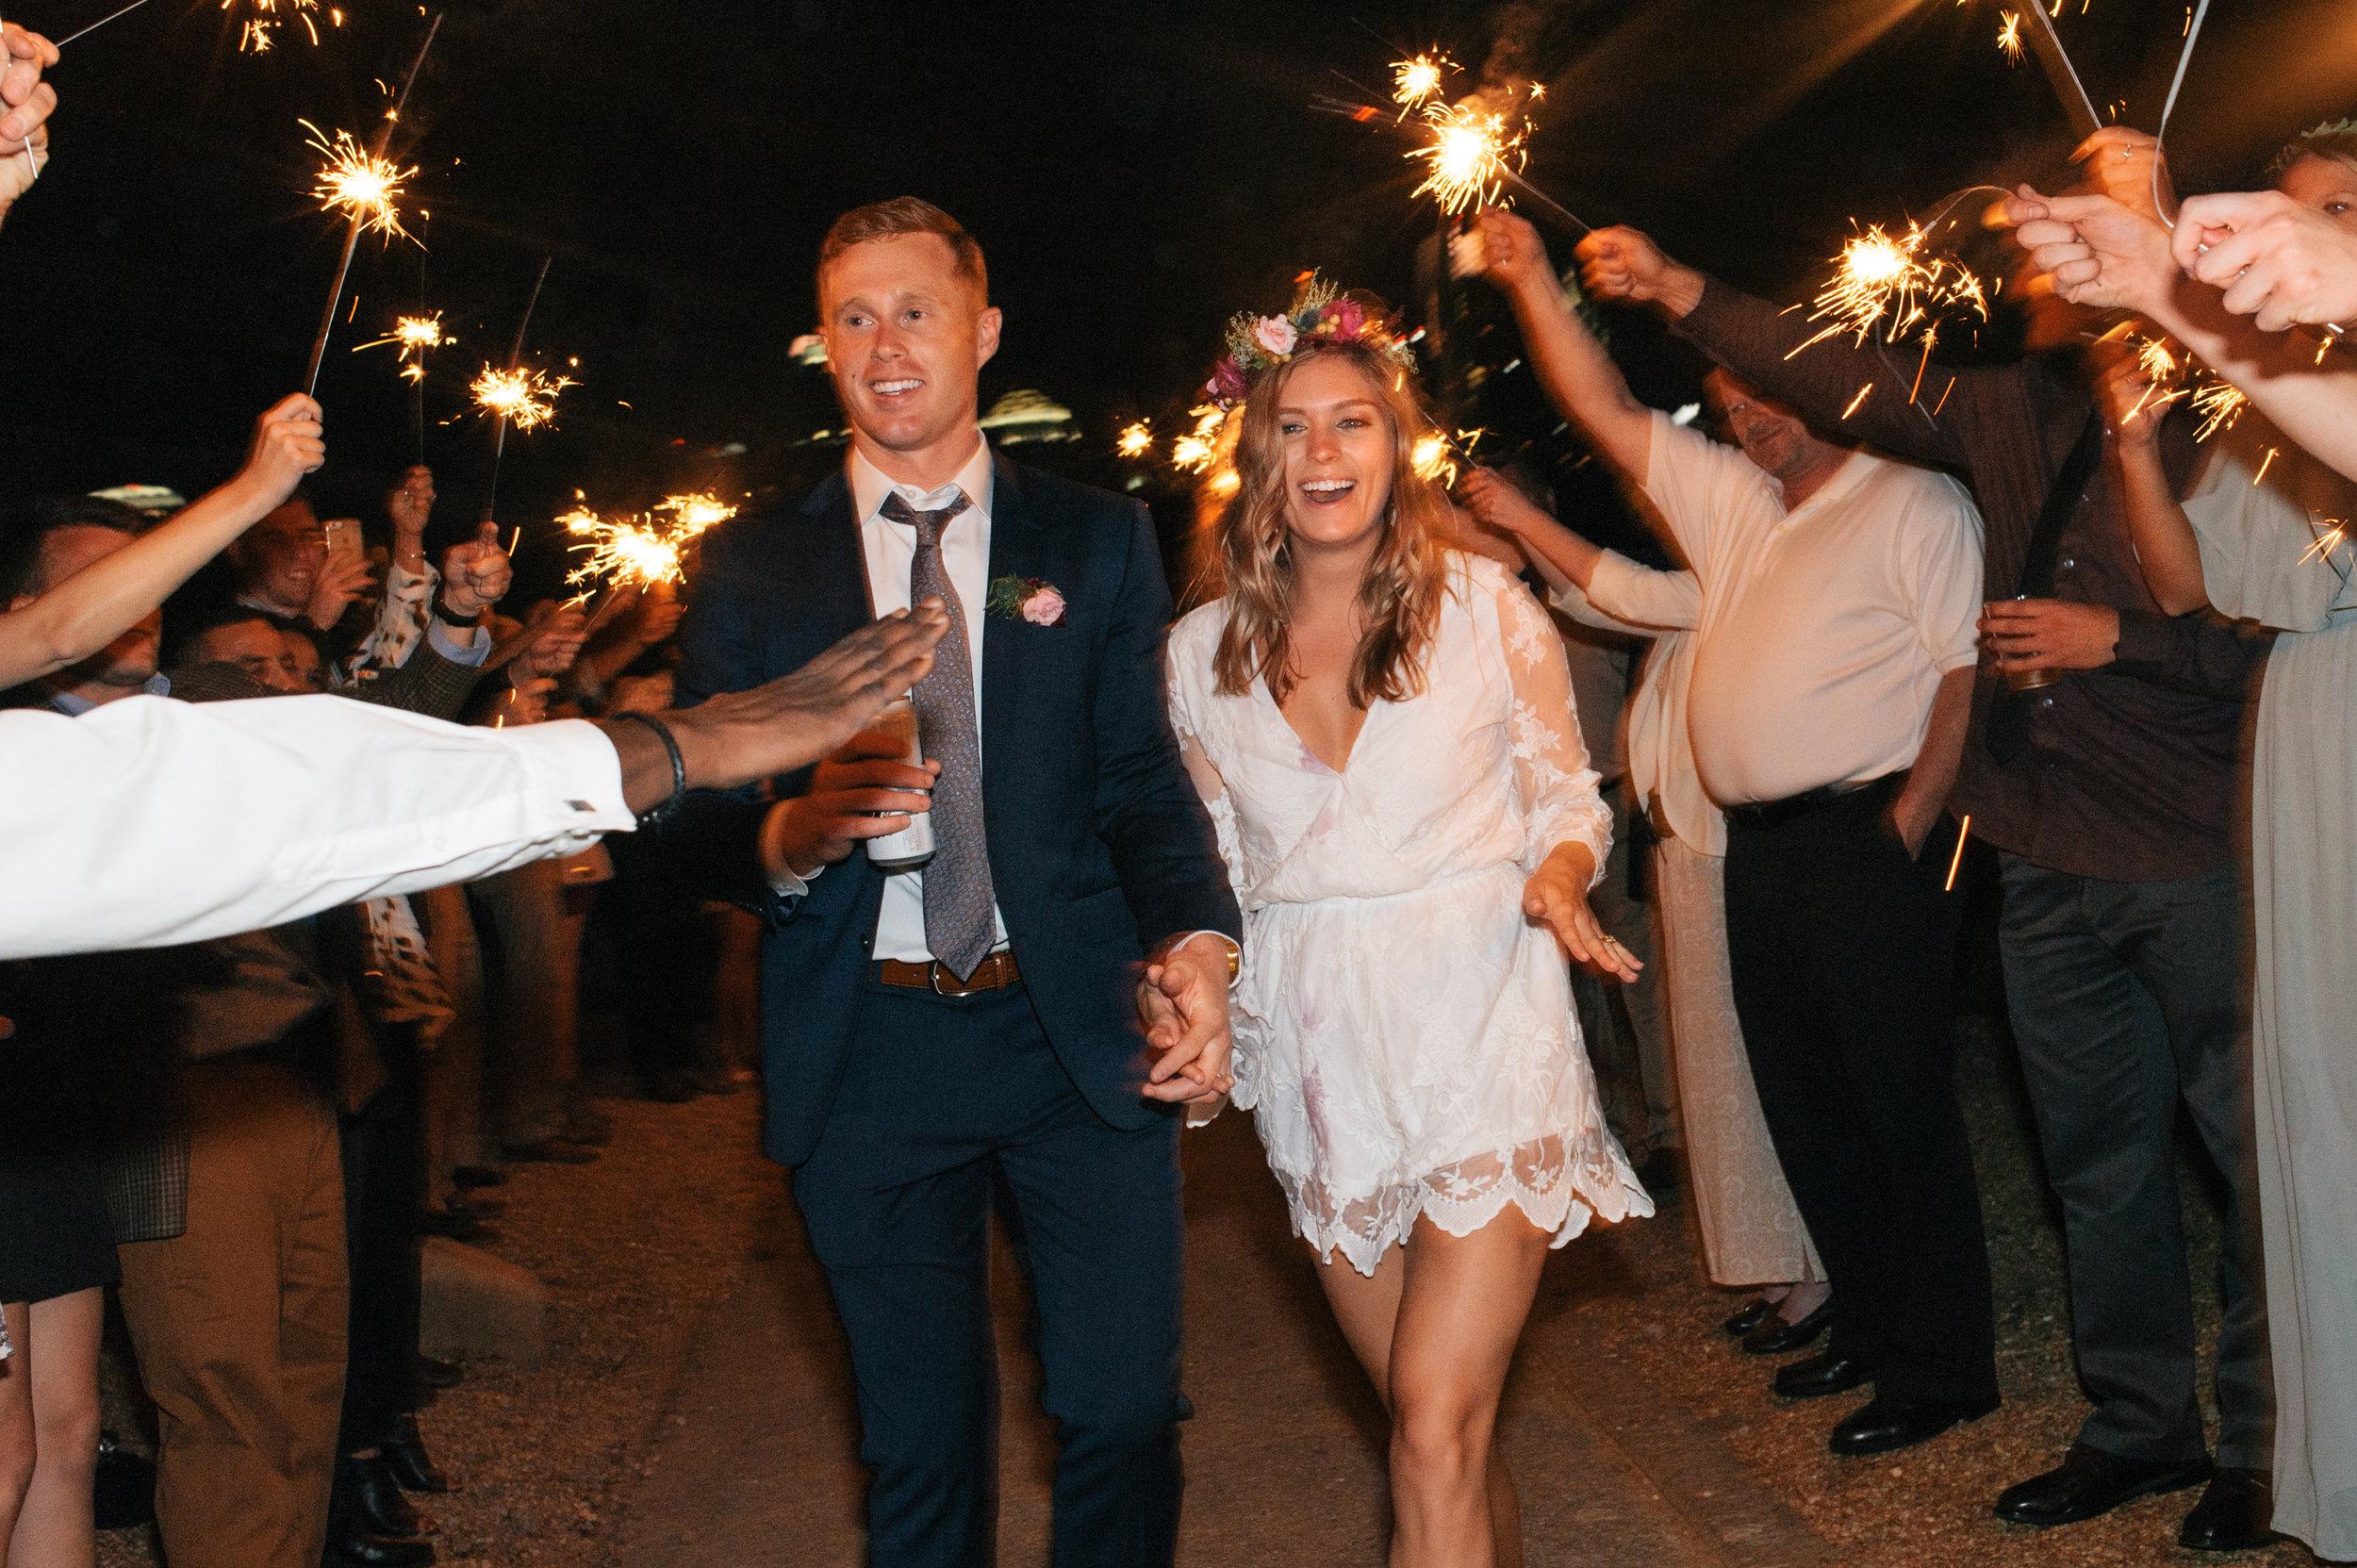 kristin-and-peter-atlanta-georgia-wedding-october-8th-2016 (1058 of 1068).jpg